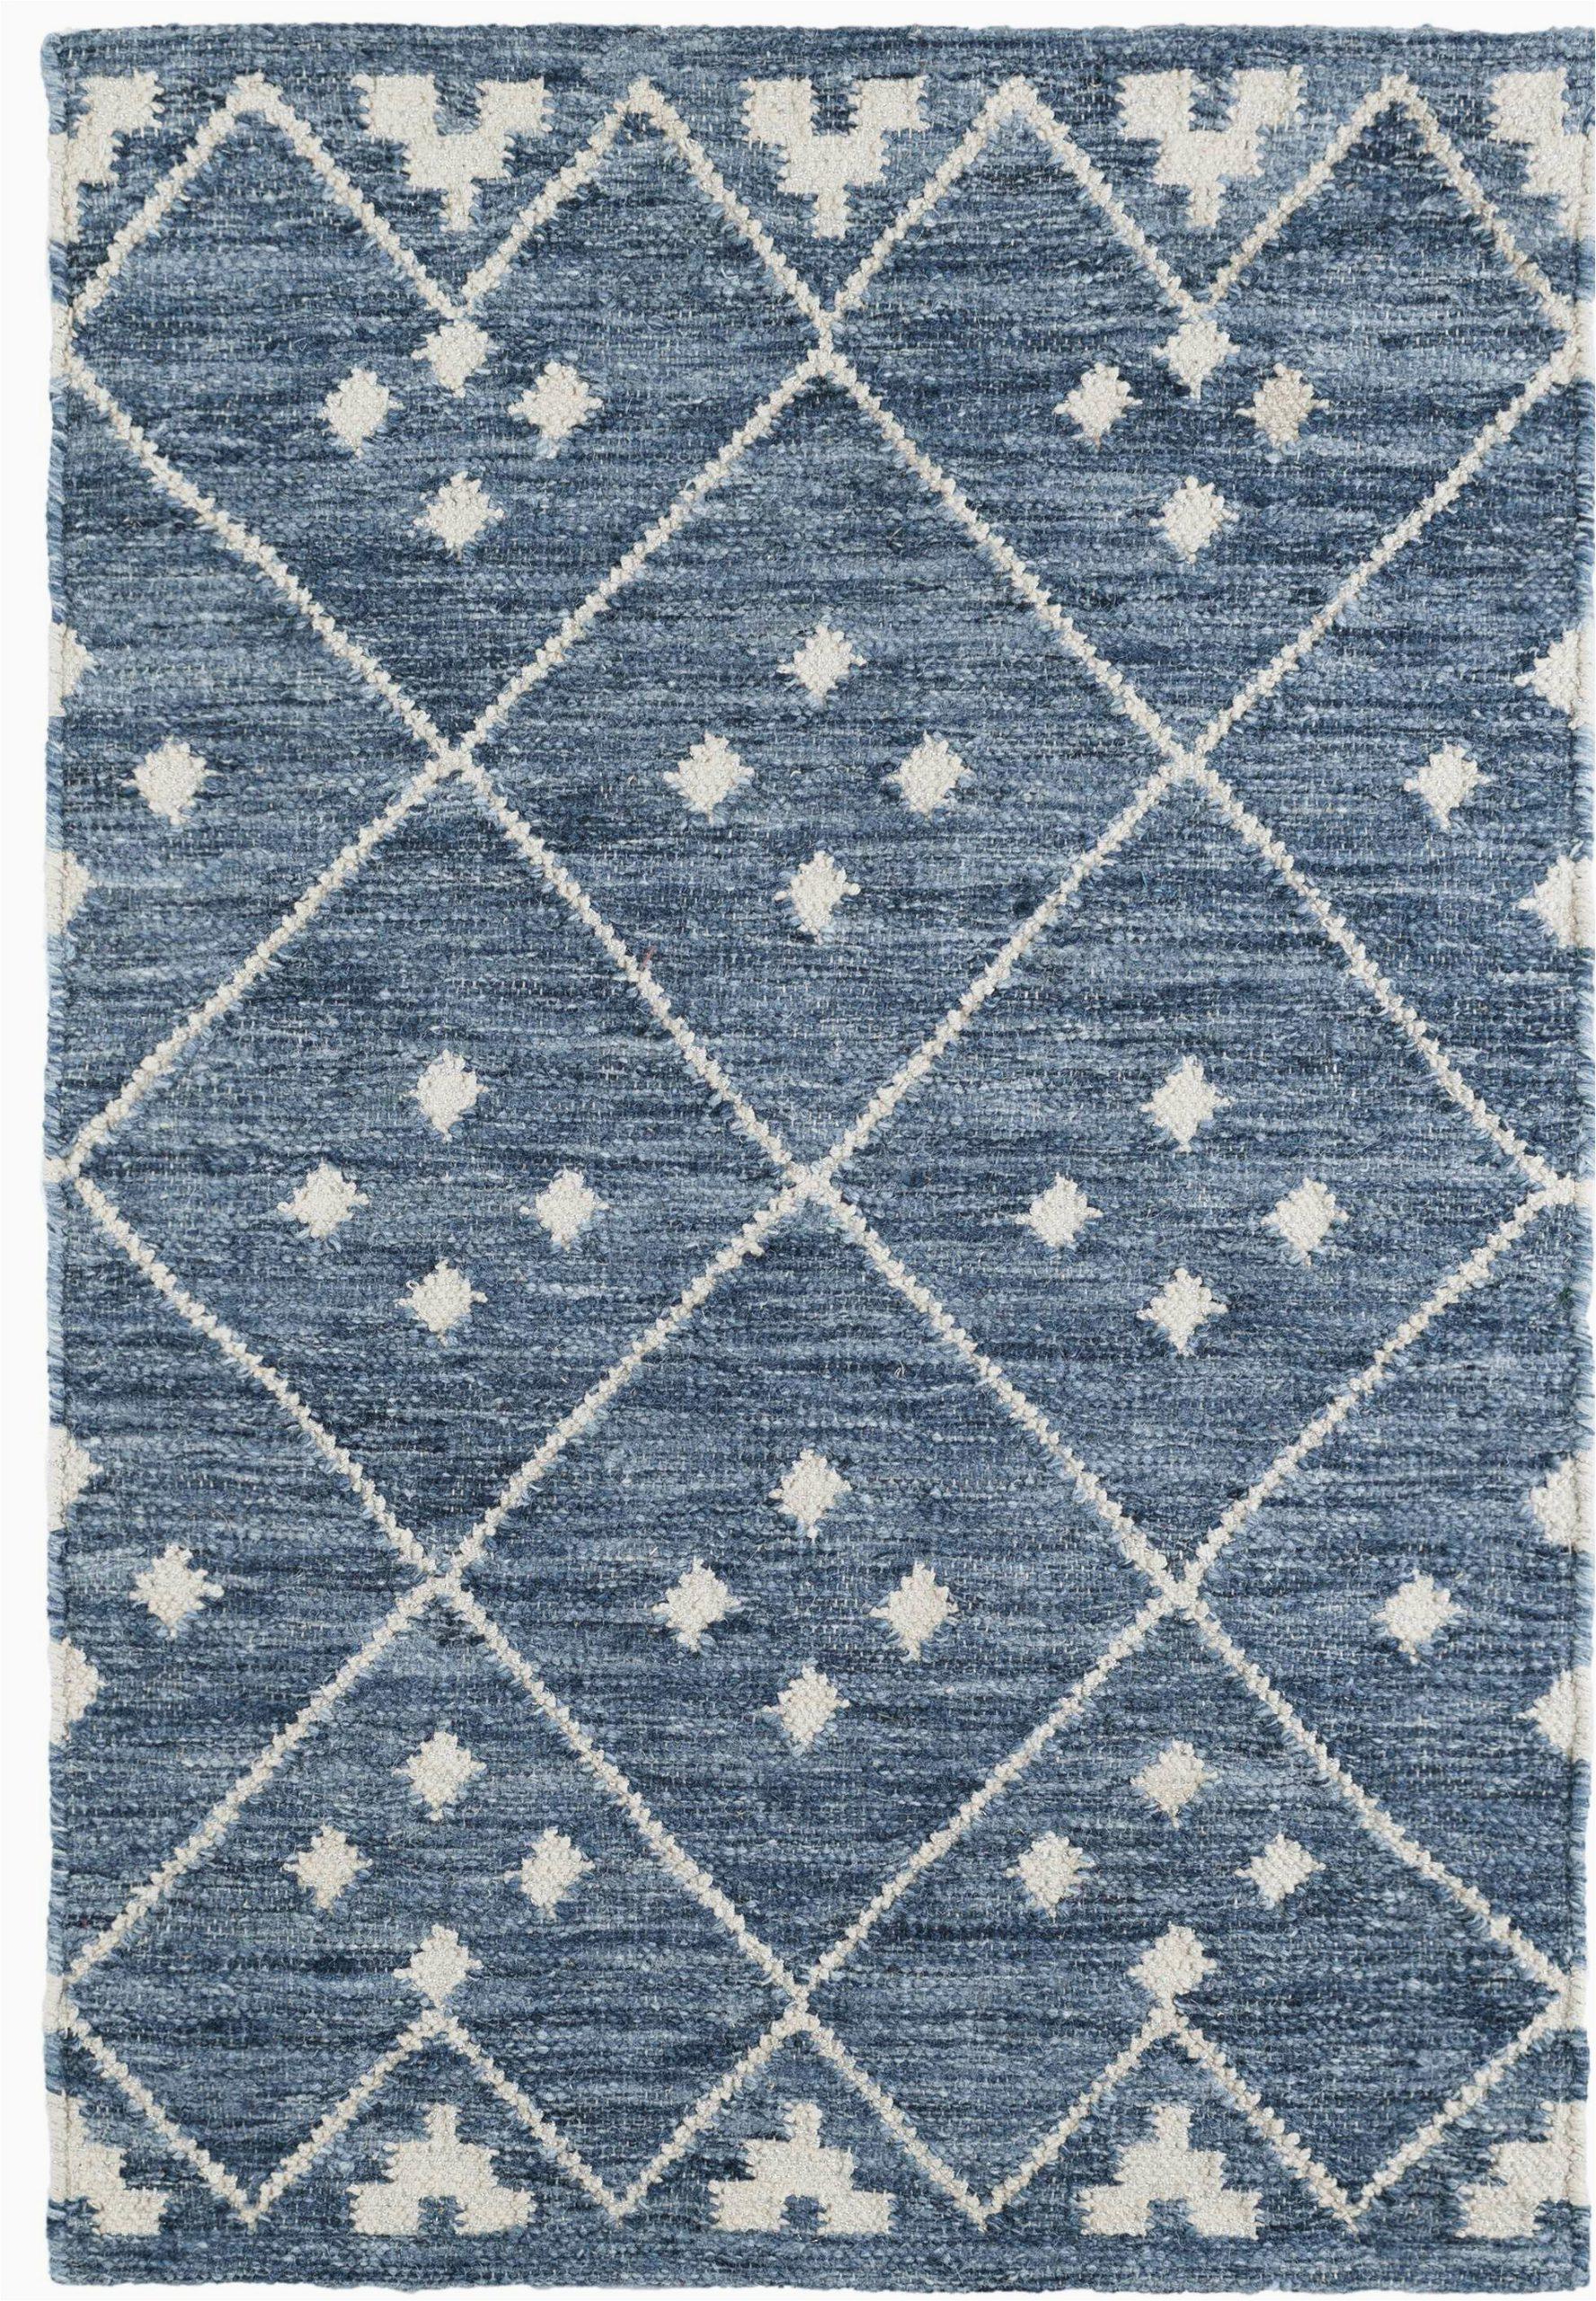 Wayfair Rugs Blue and White Kota Geometric Handmade Kilim Blue White area Rug